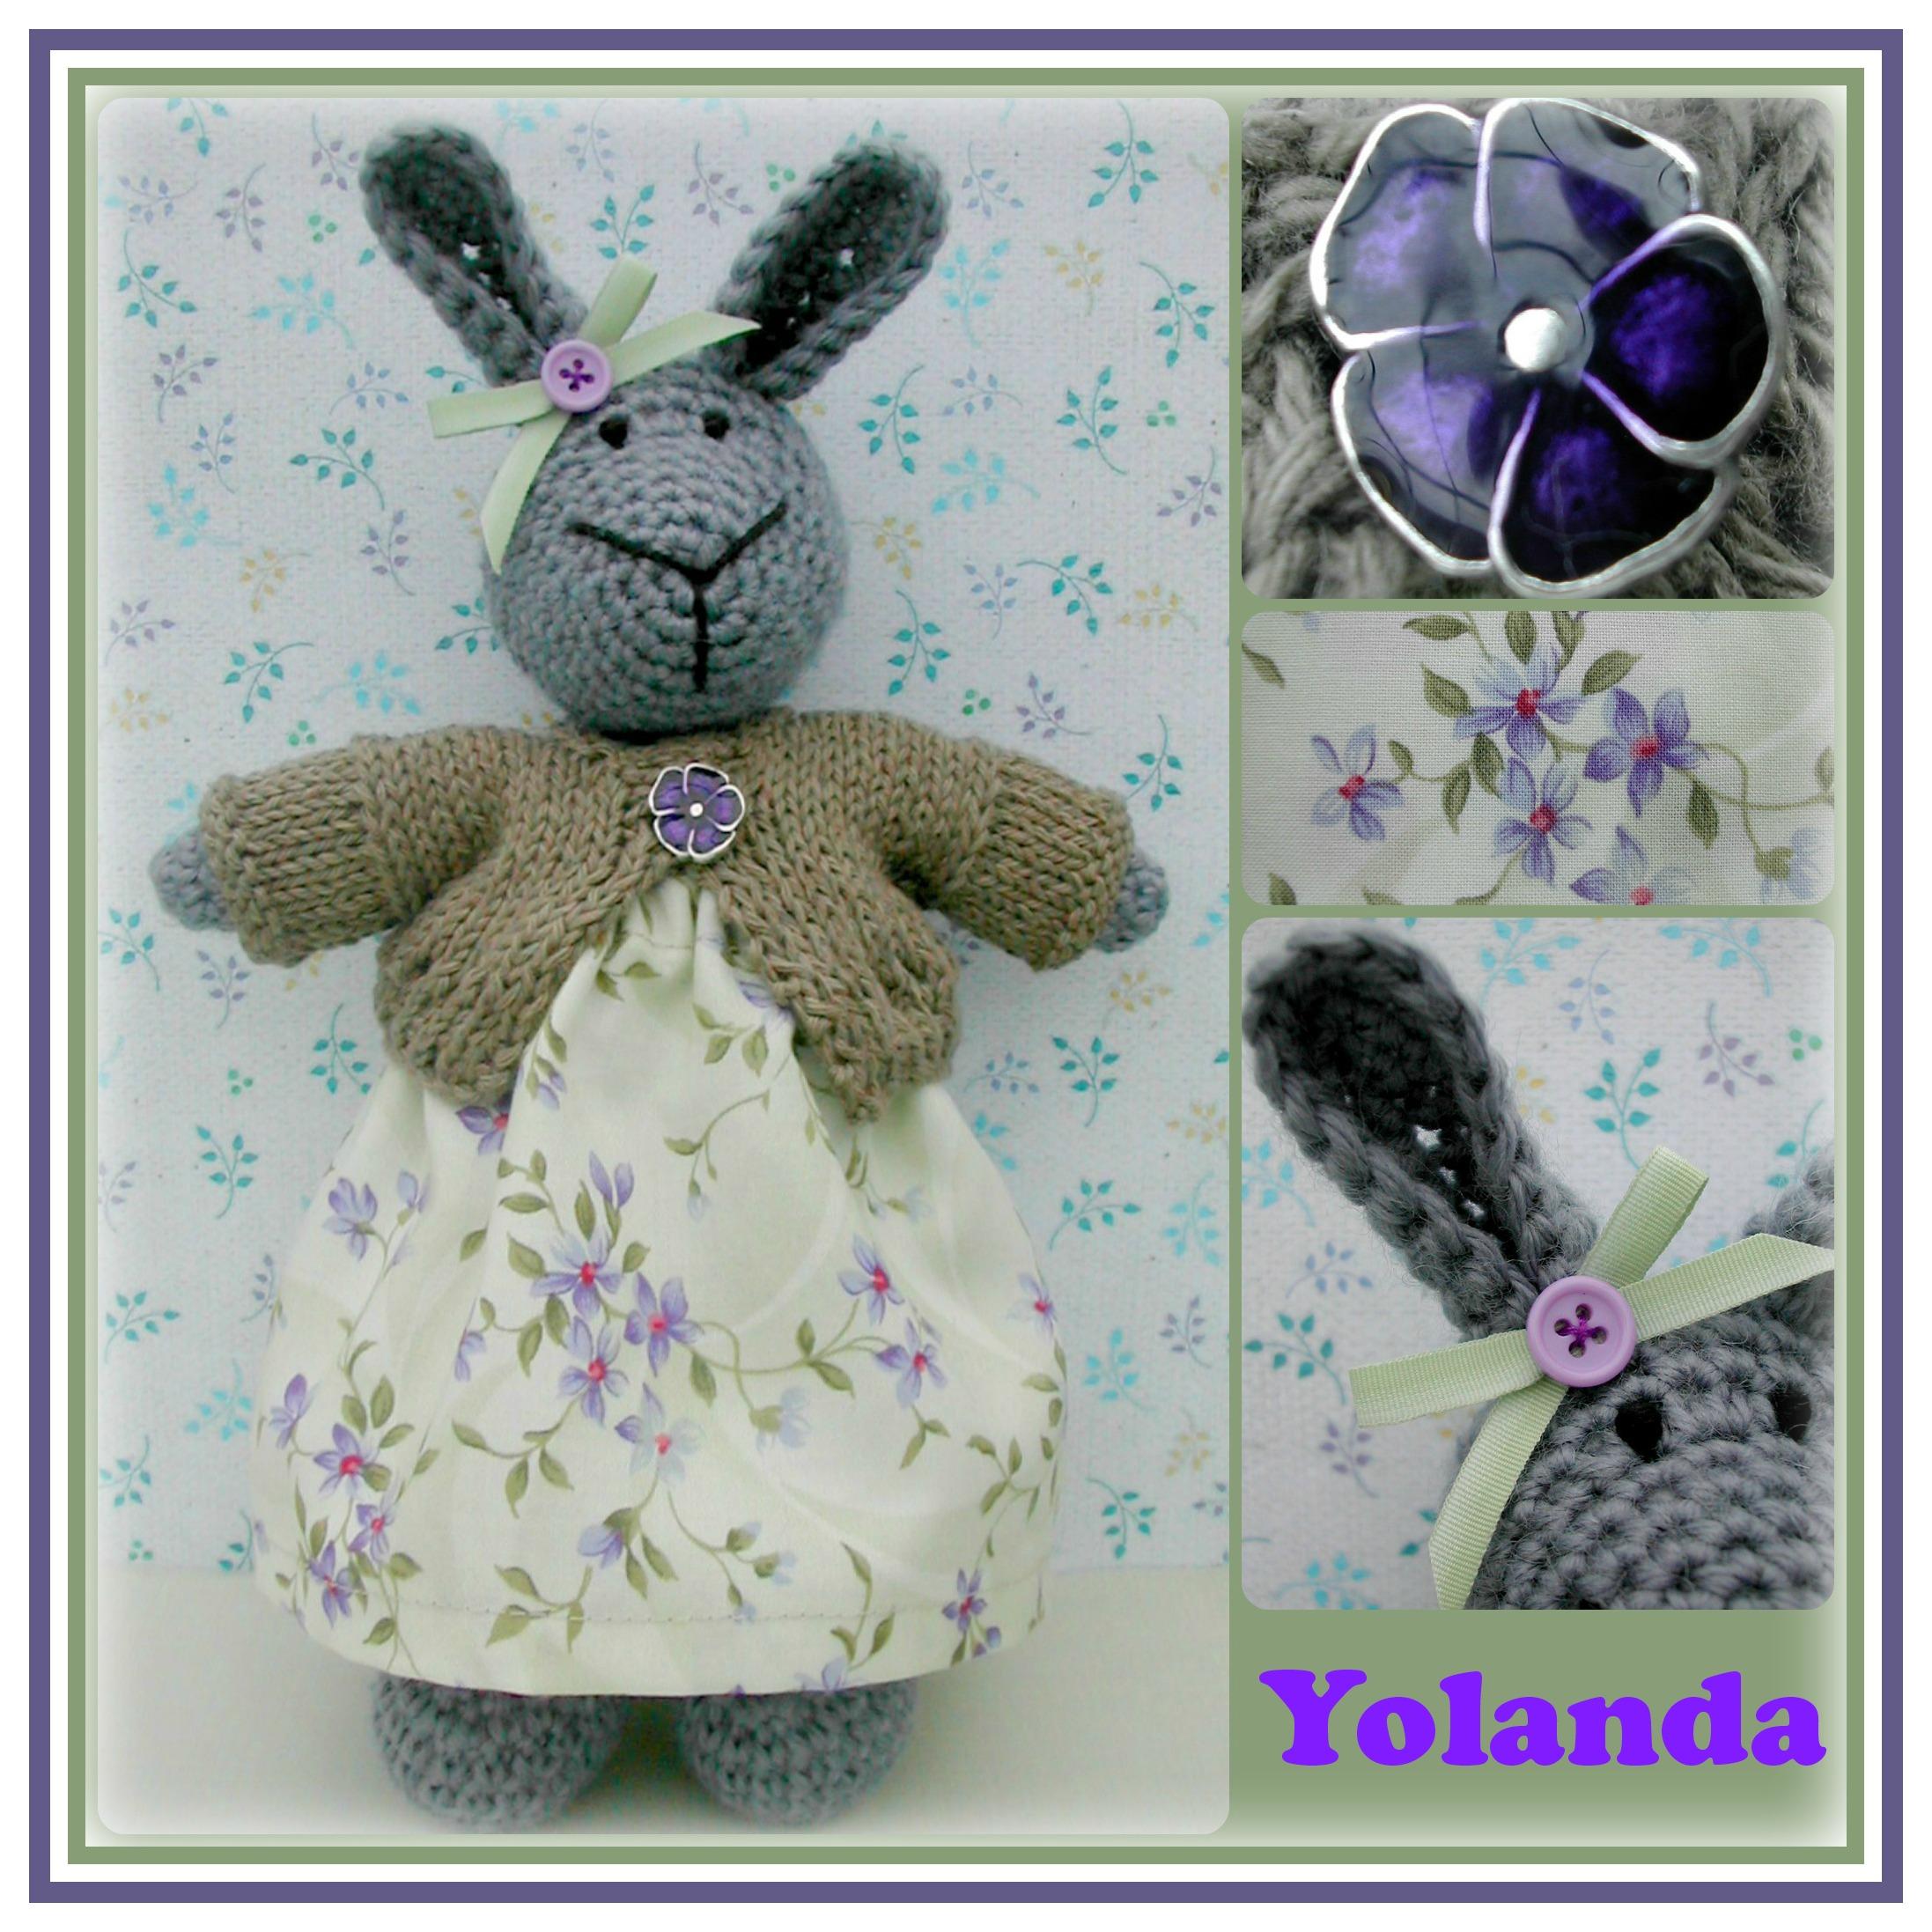 Yolanda Collage